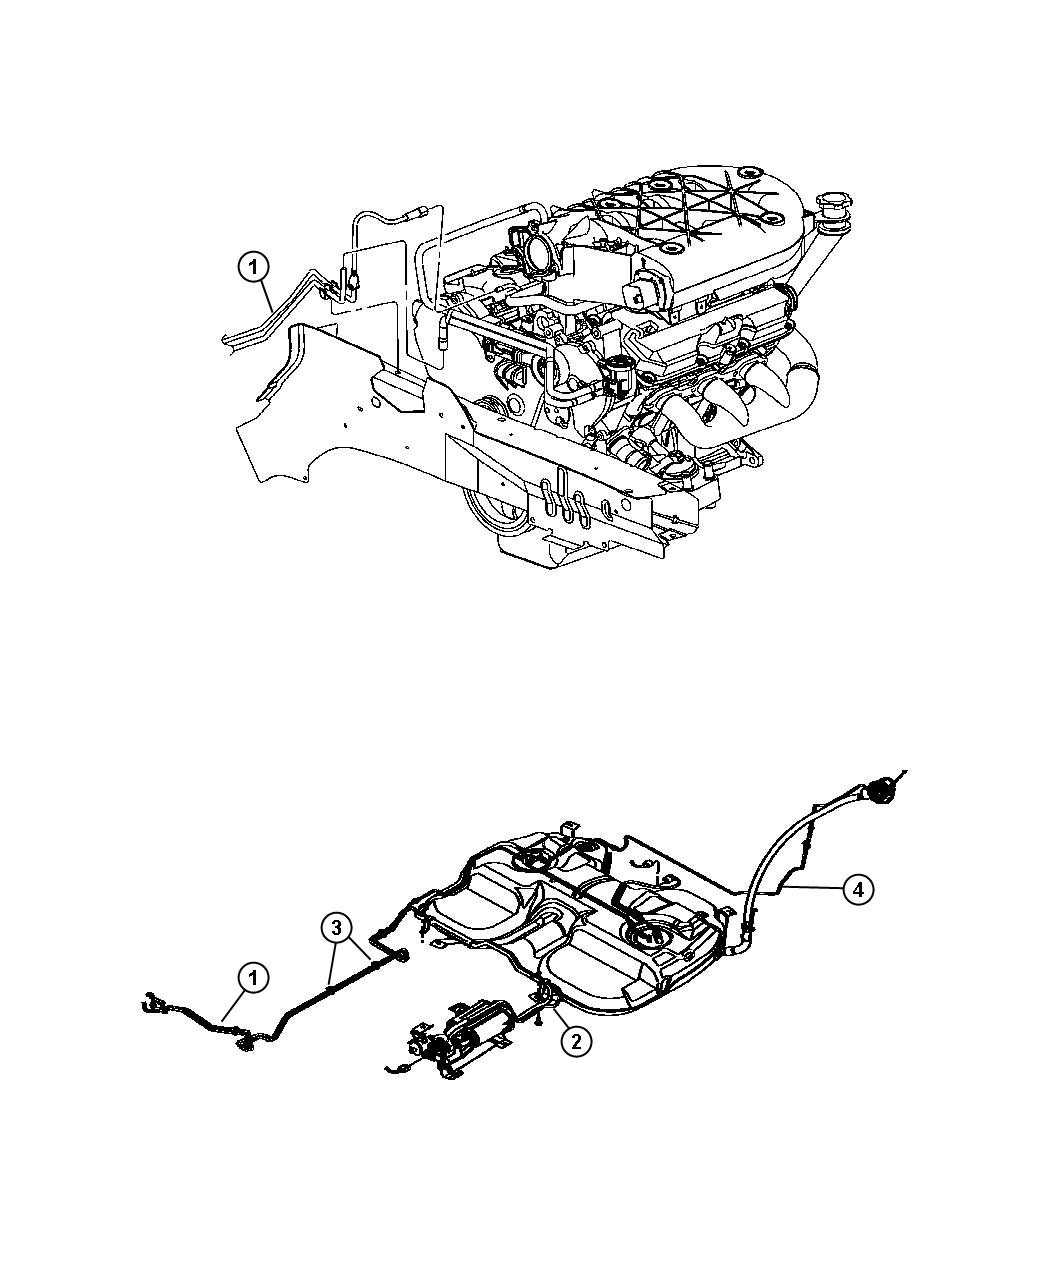 Chrysler Pacifica Fuel Lines 3 5l V6 24v Mpi Engine